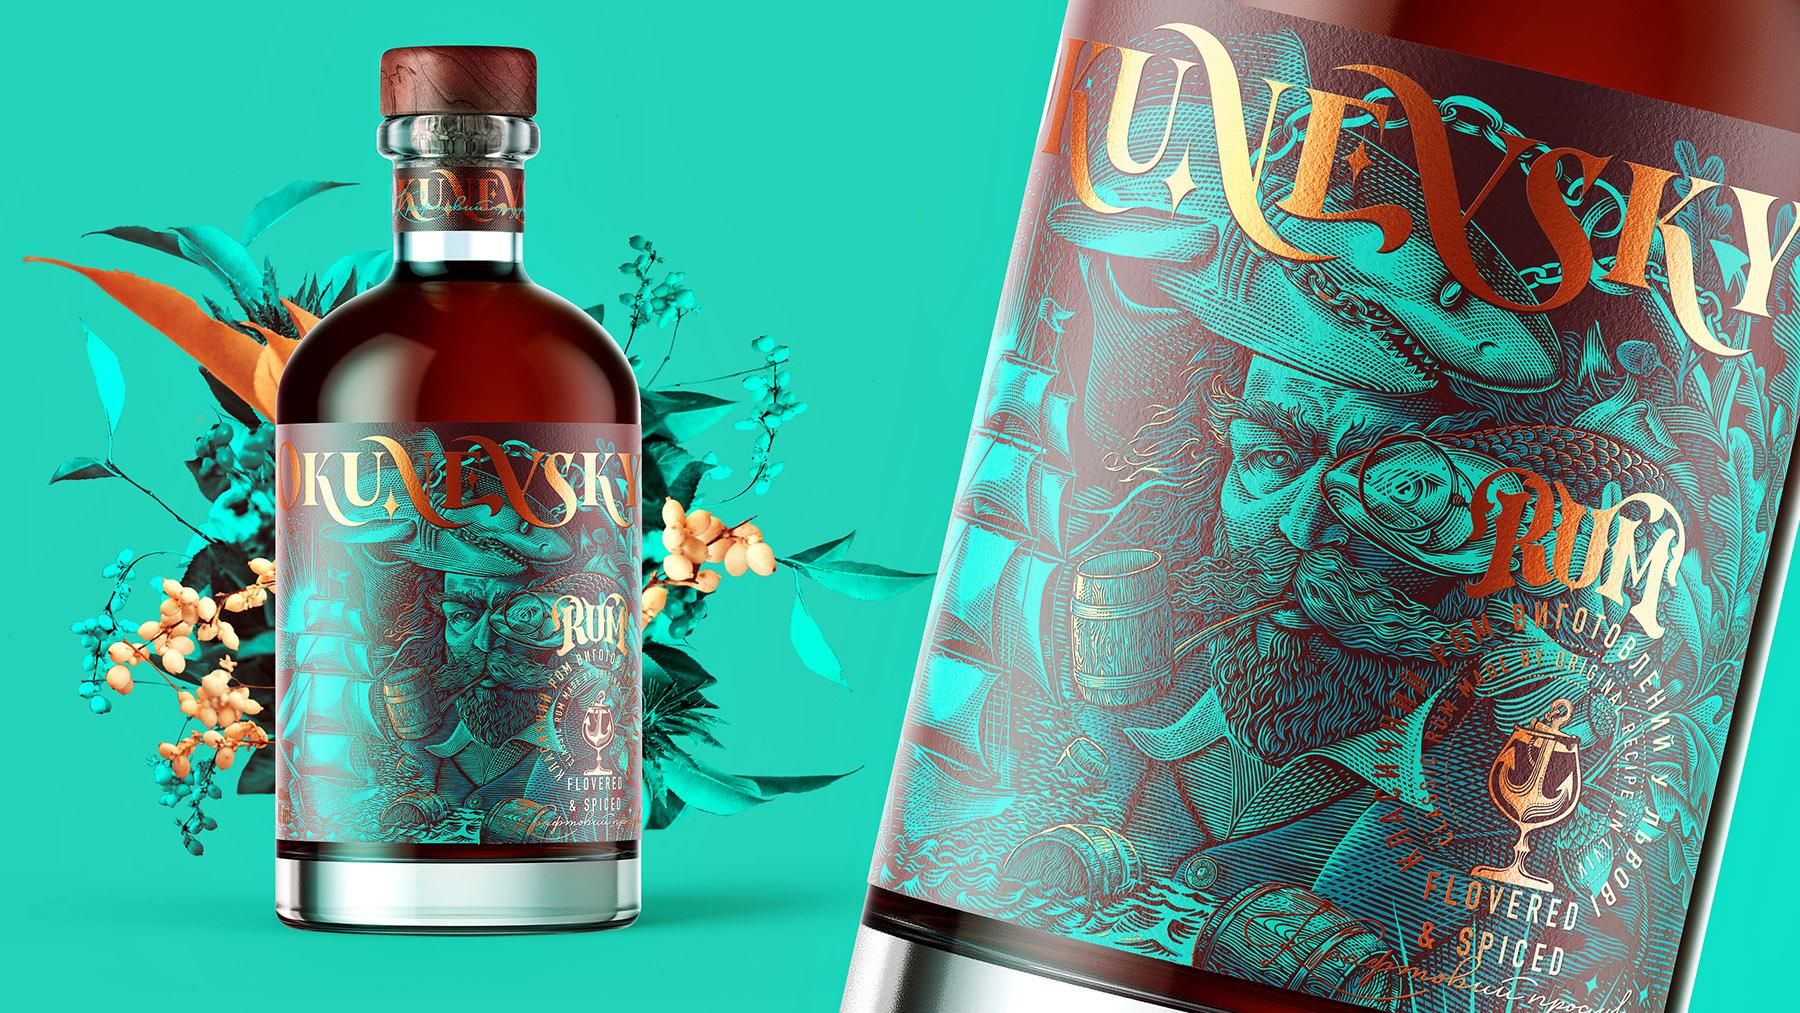 Umbradesign Create Branding and Packaging Design Project for Okunevsky Rum